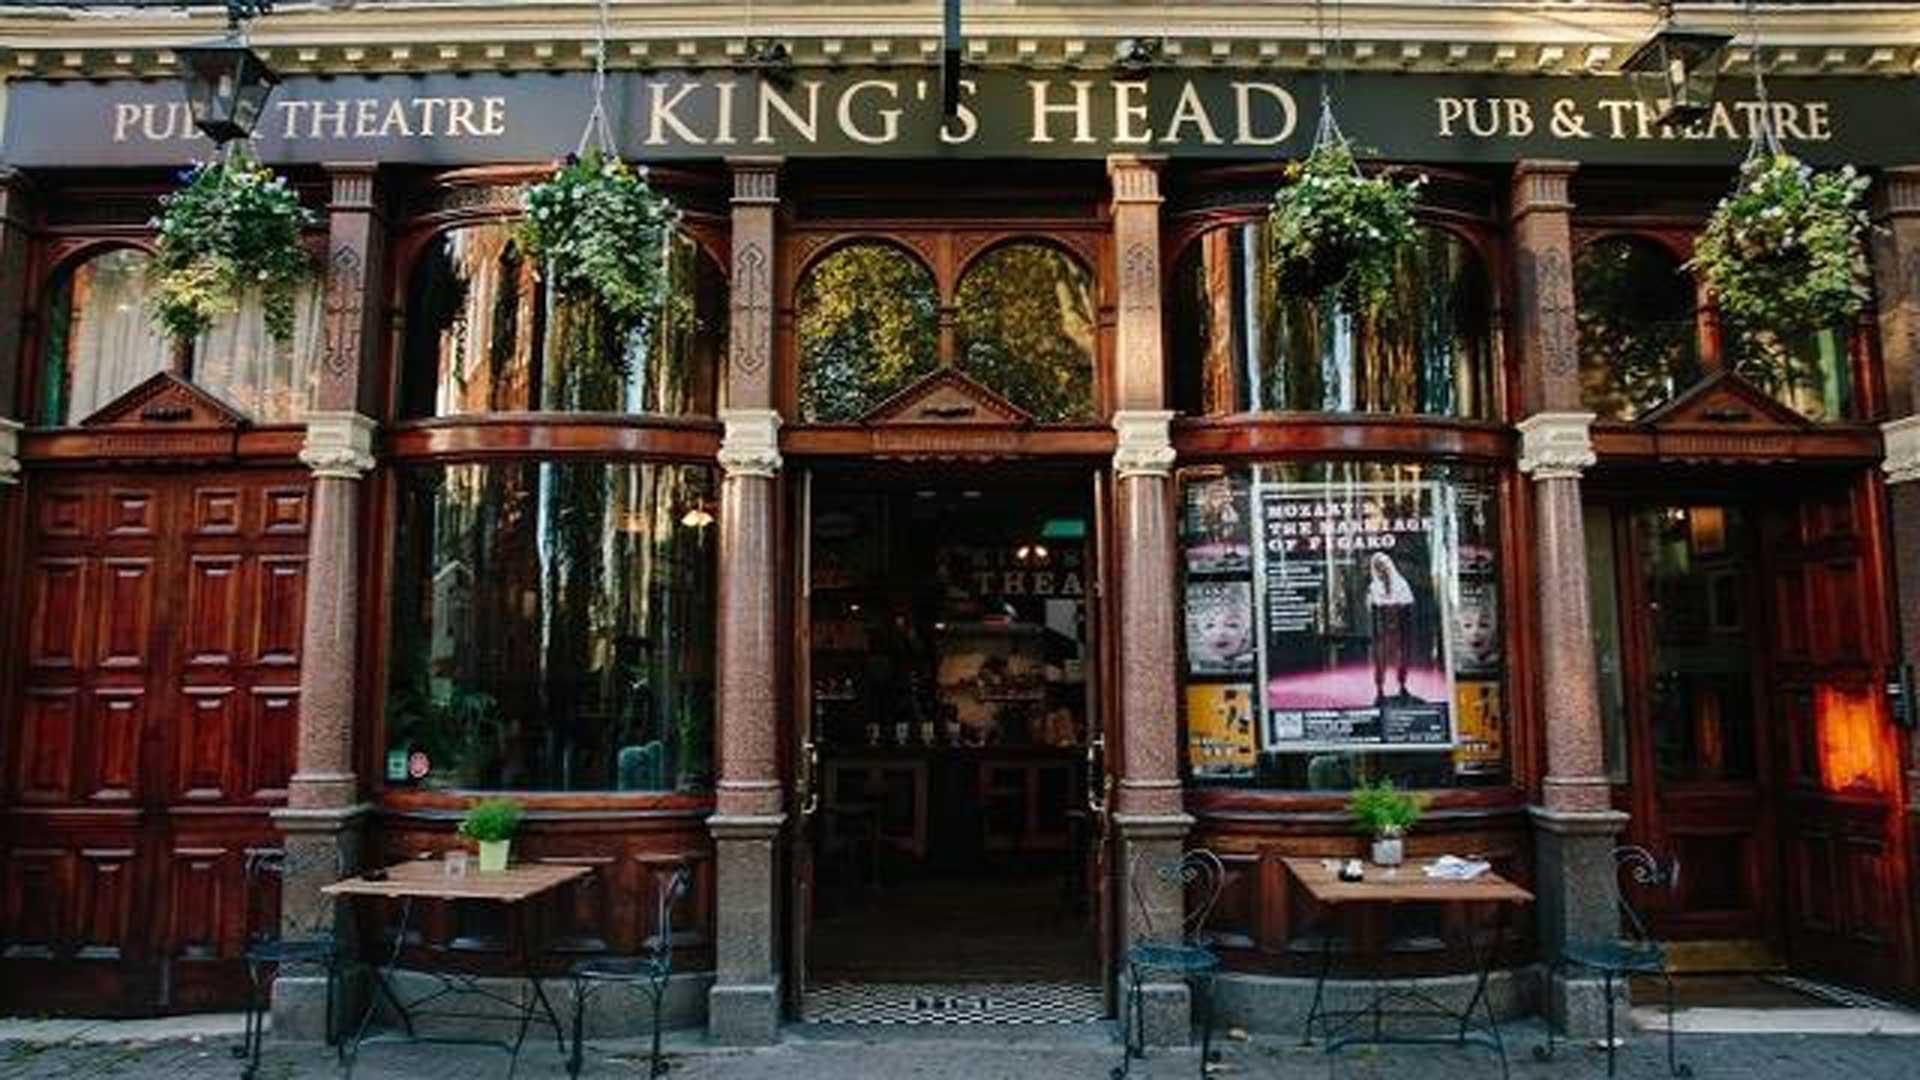 King's Head Theatre to Move